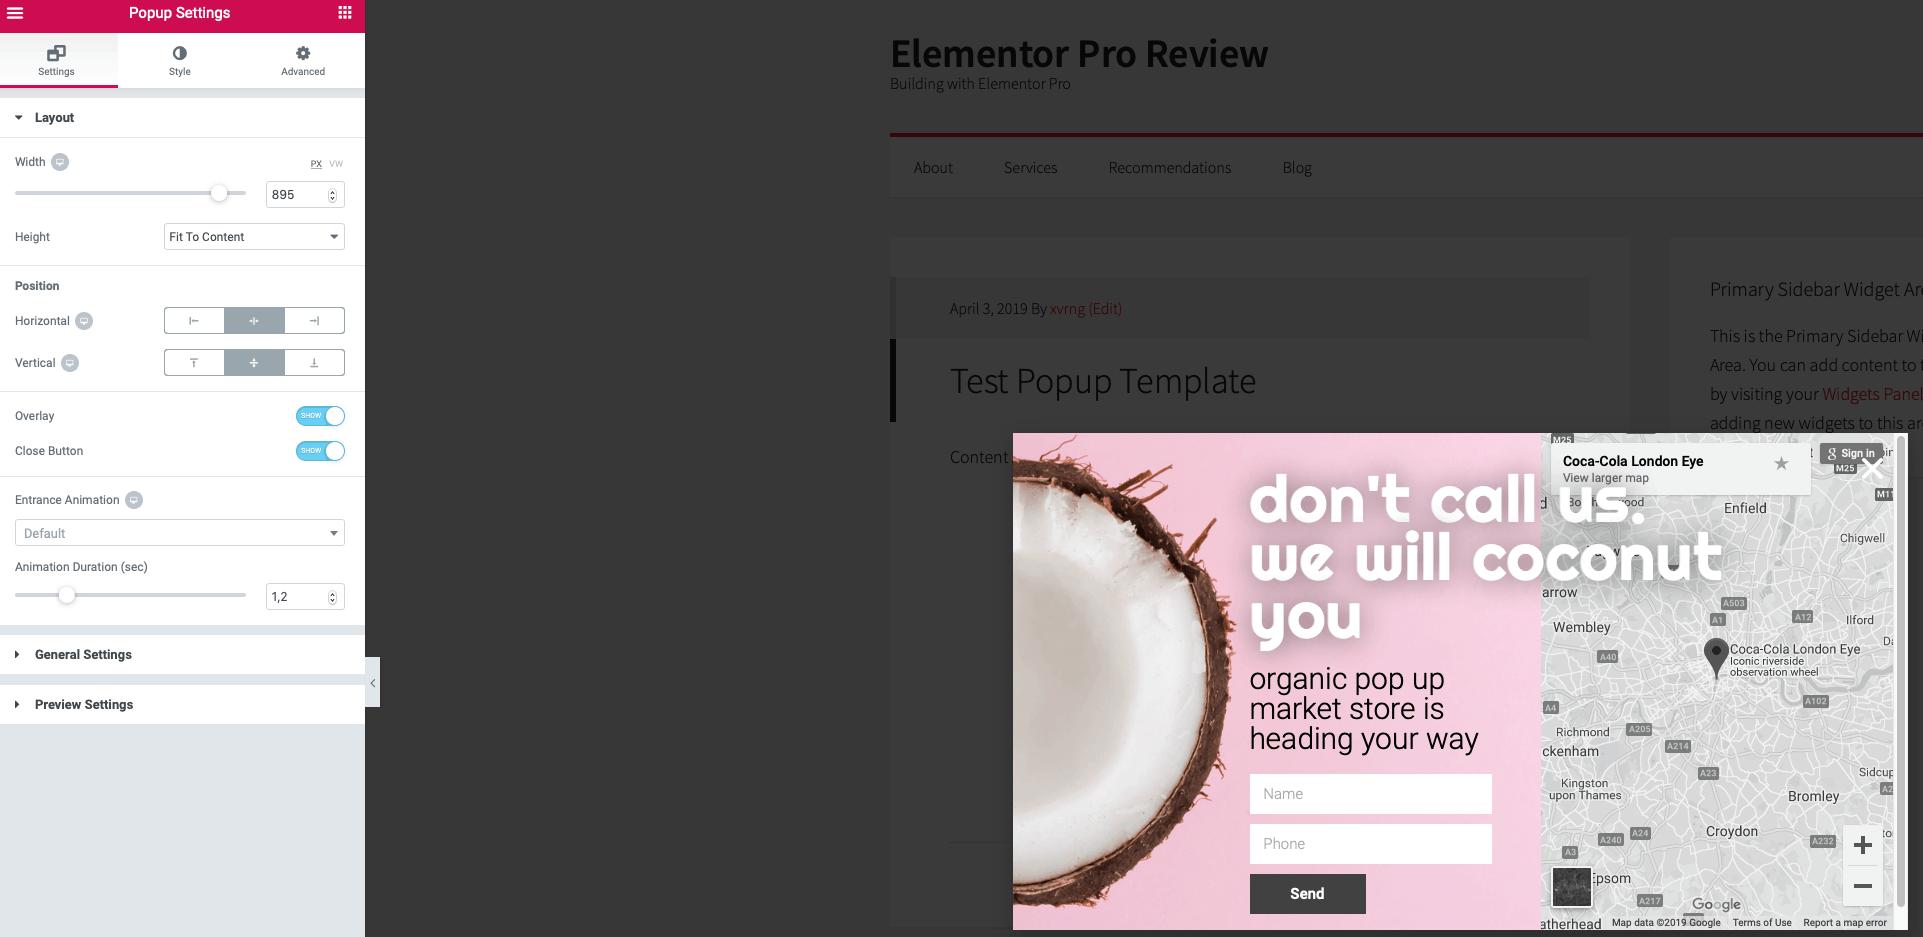 elementor pro review edit mode